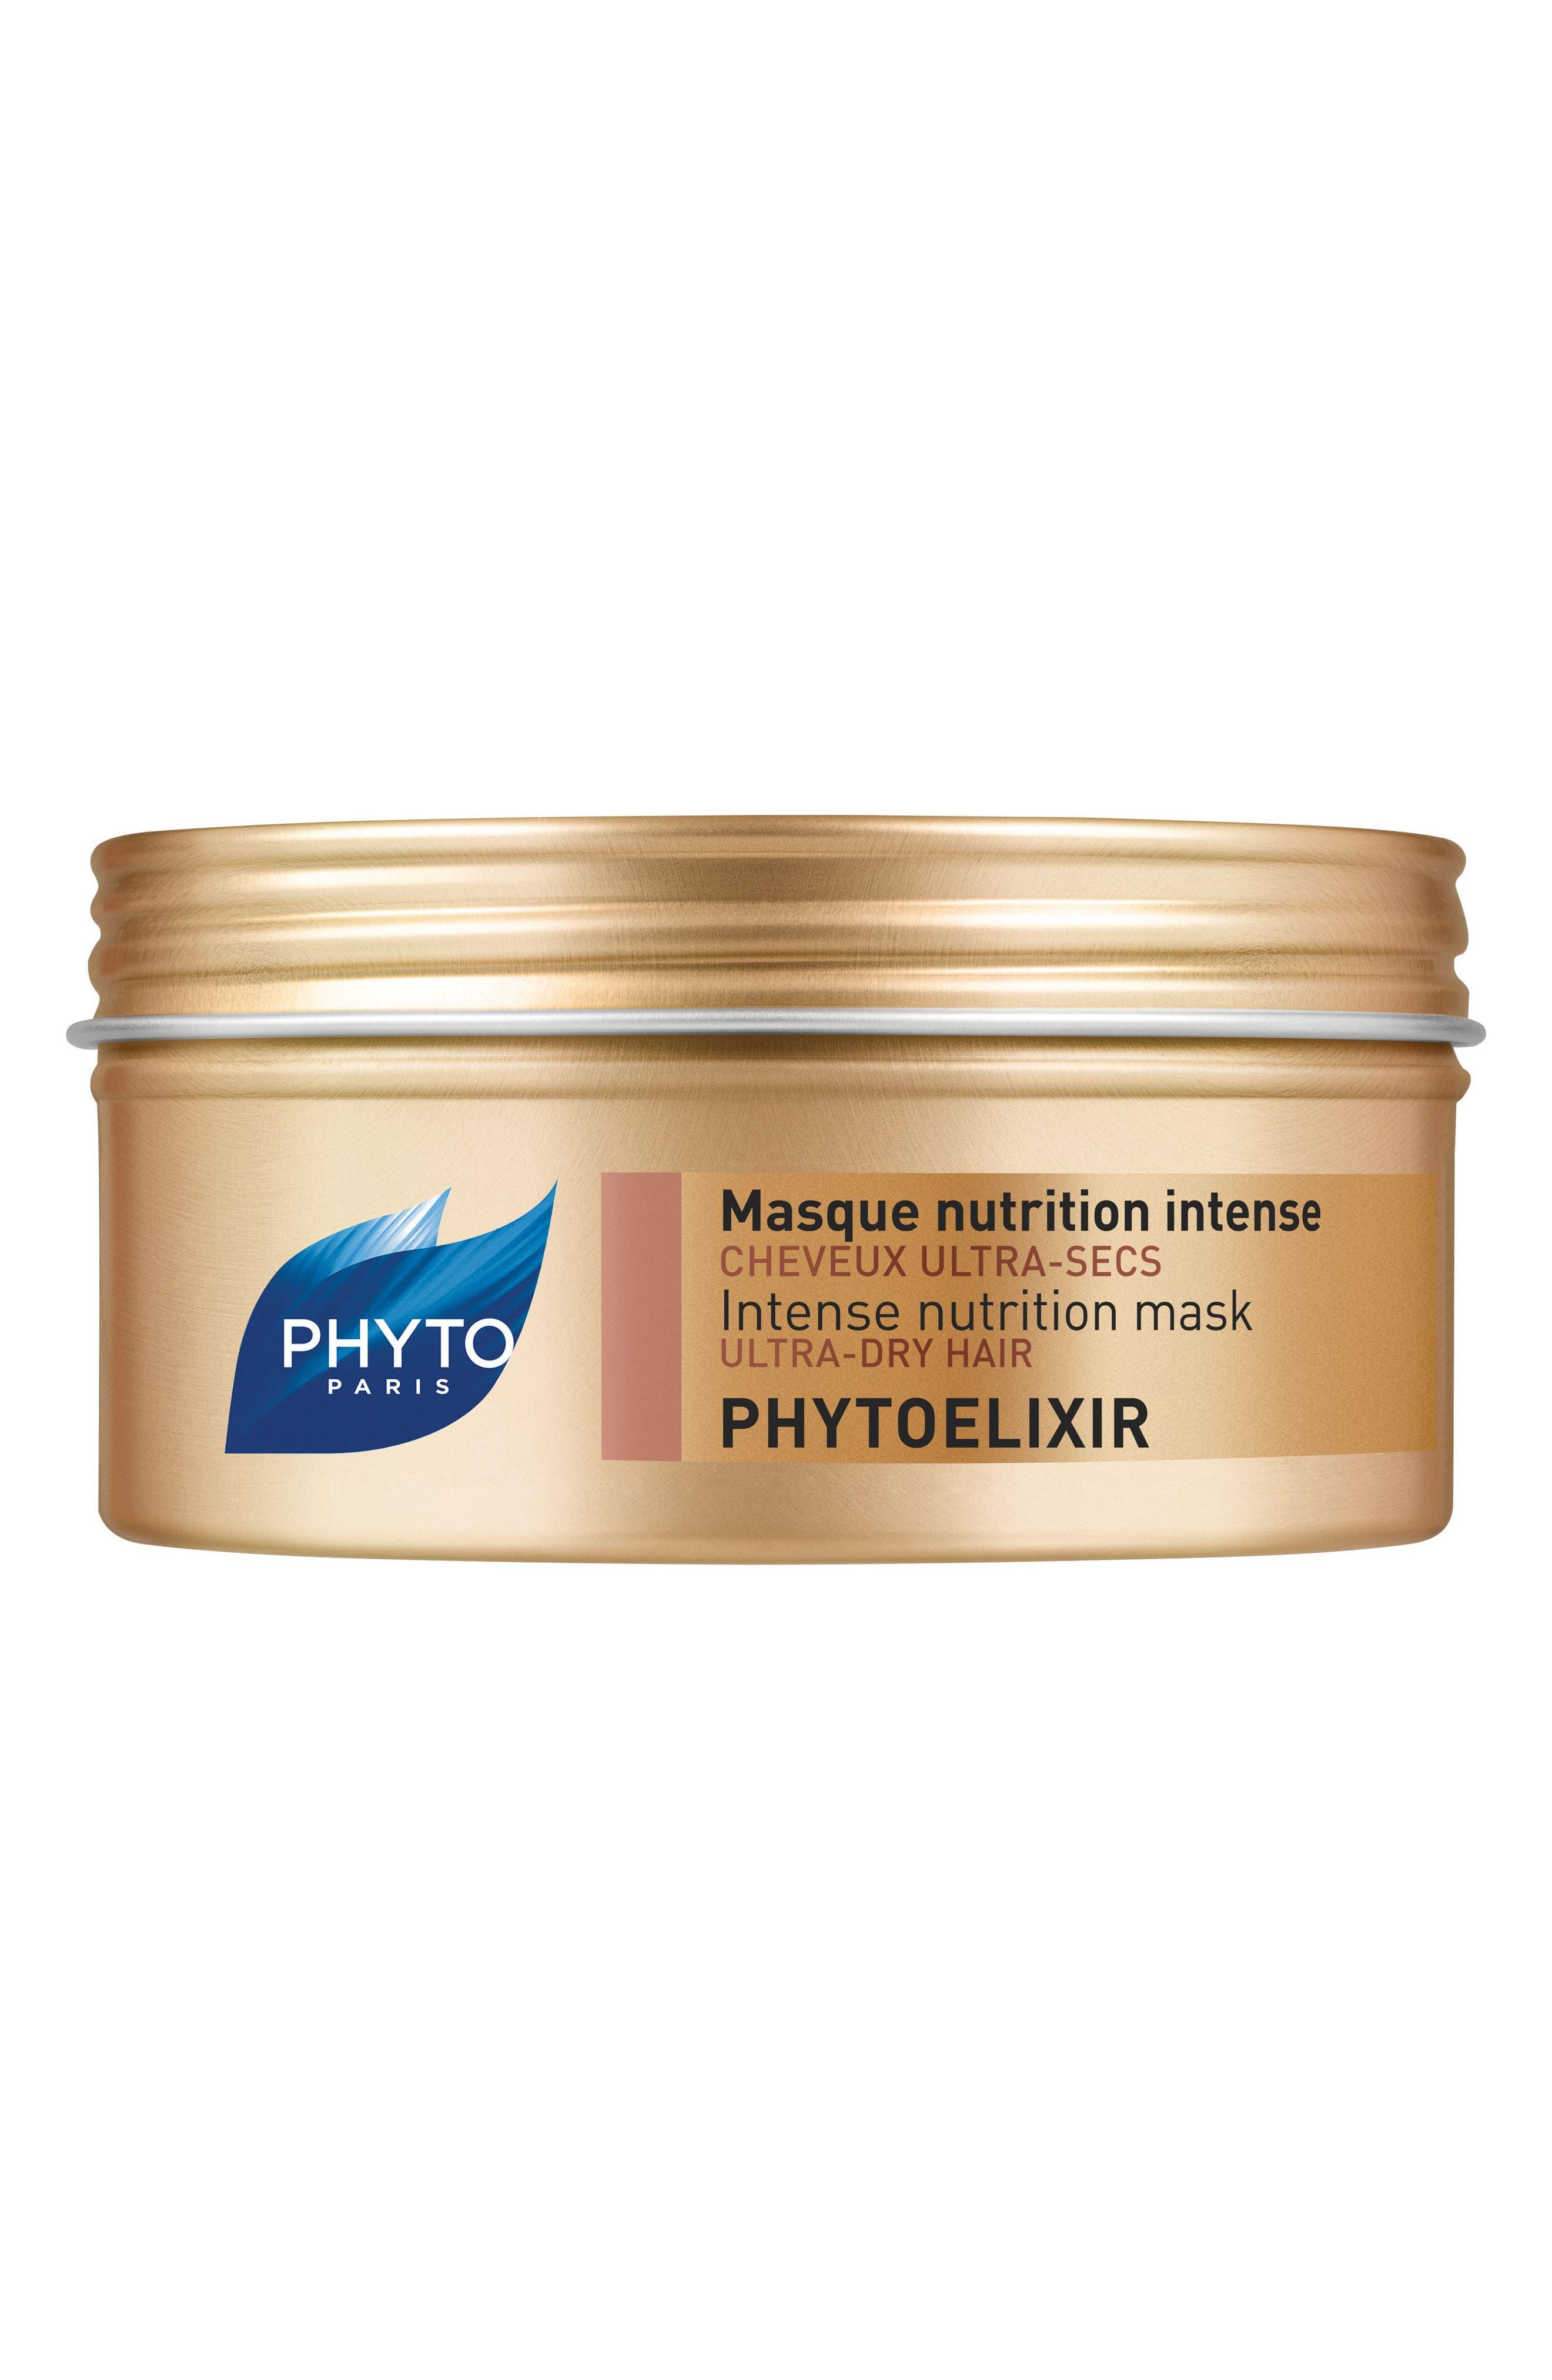 Phytoelixir Intense Nutrition Mask,                         Main,                         color, No Color